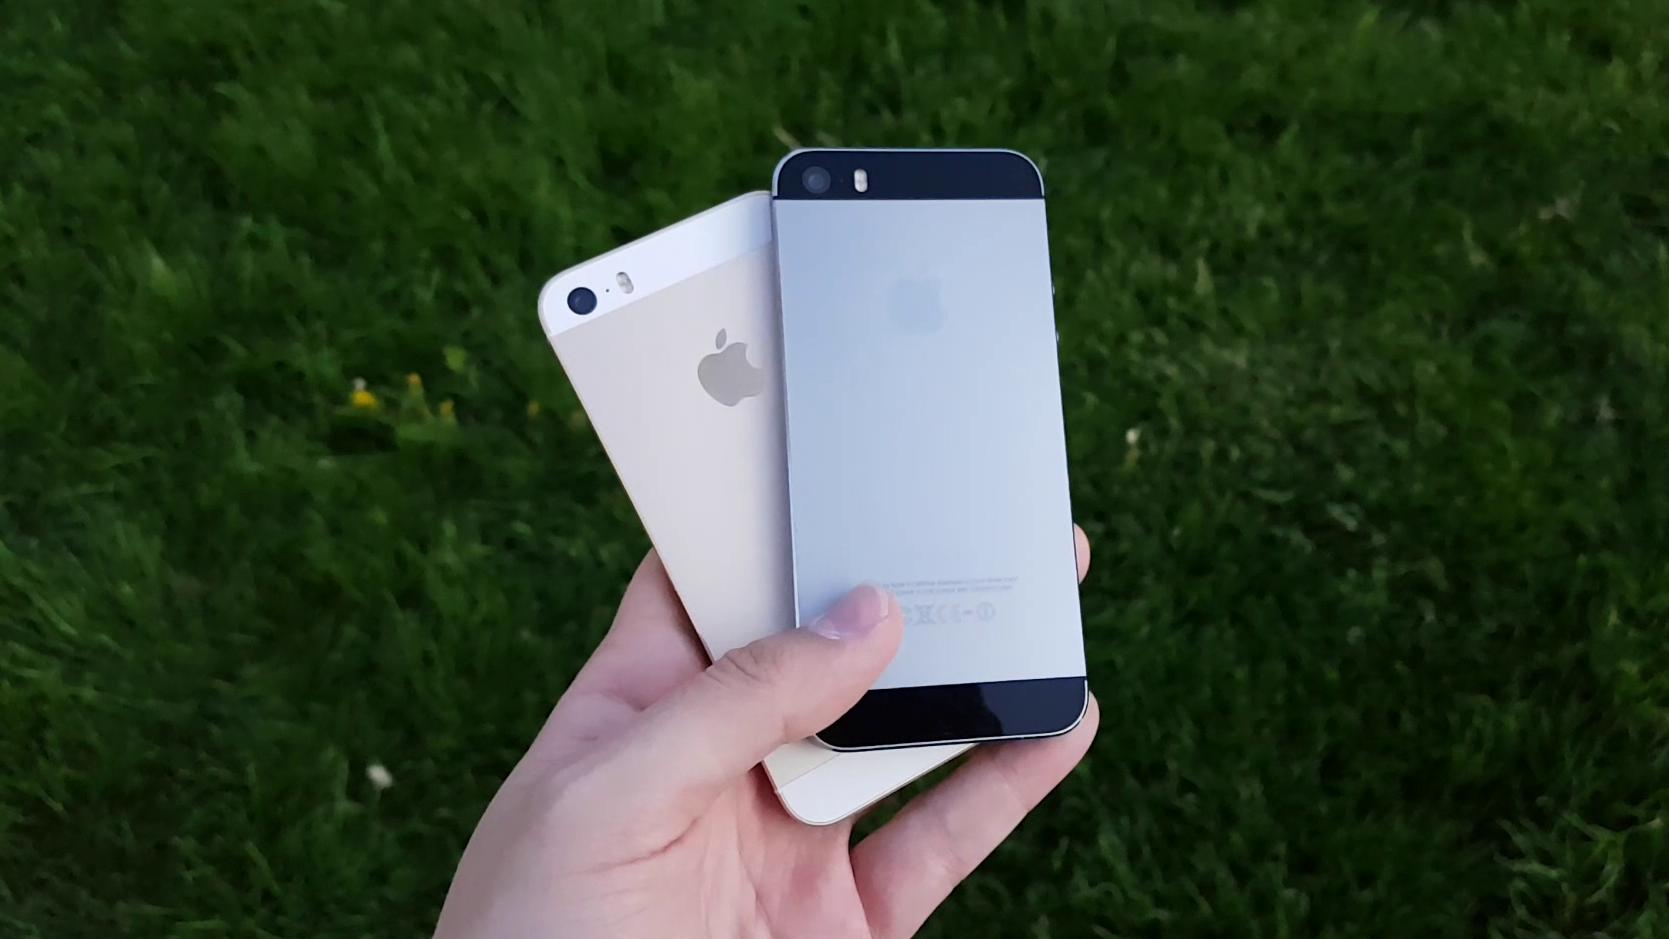 Fototest iPhone 5s vs iPhone SE